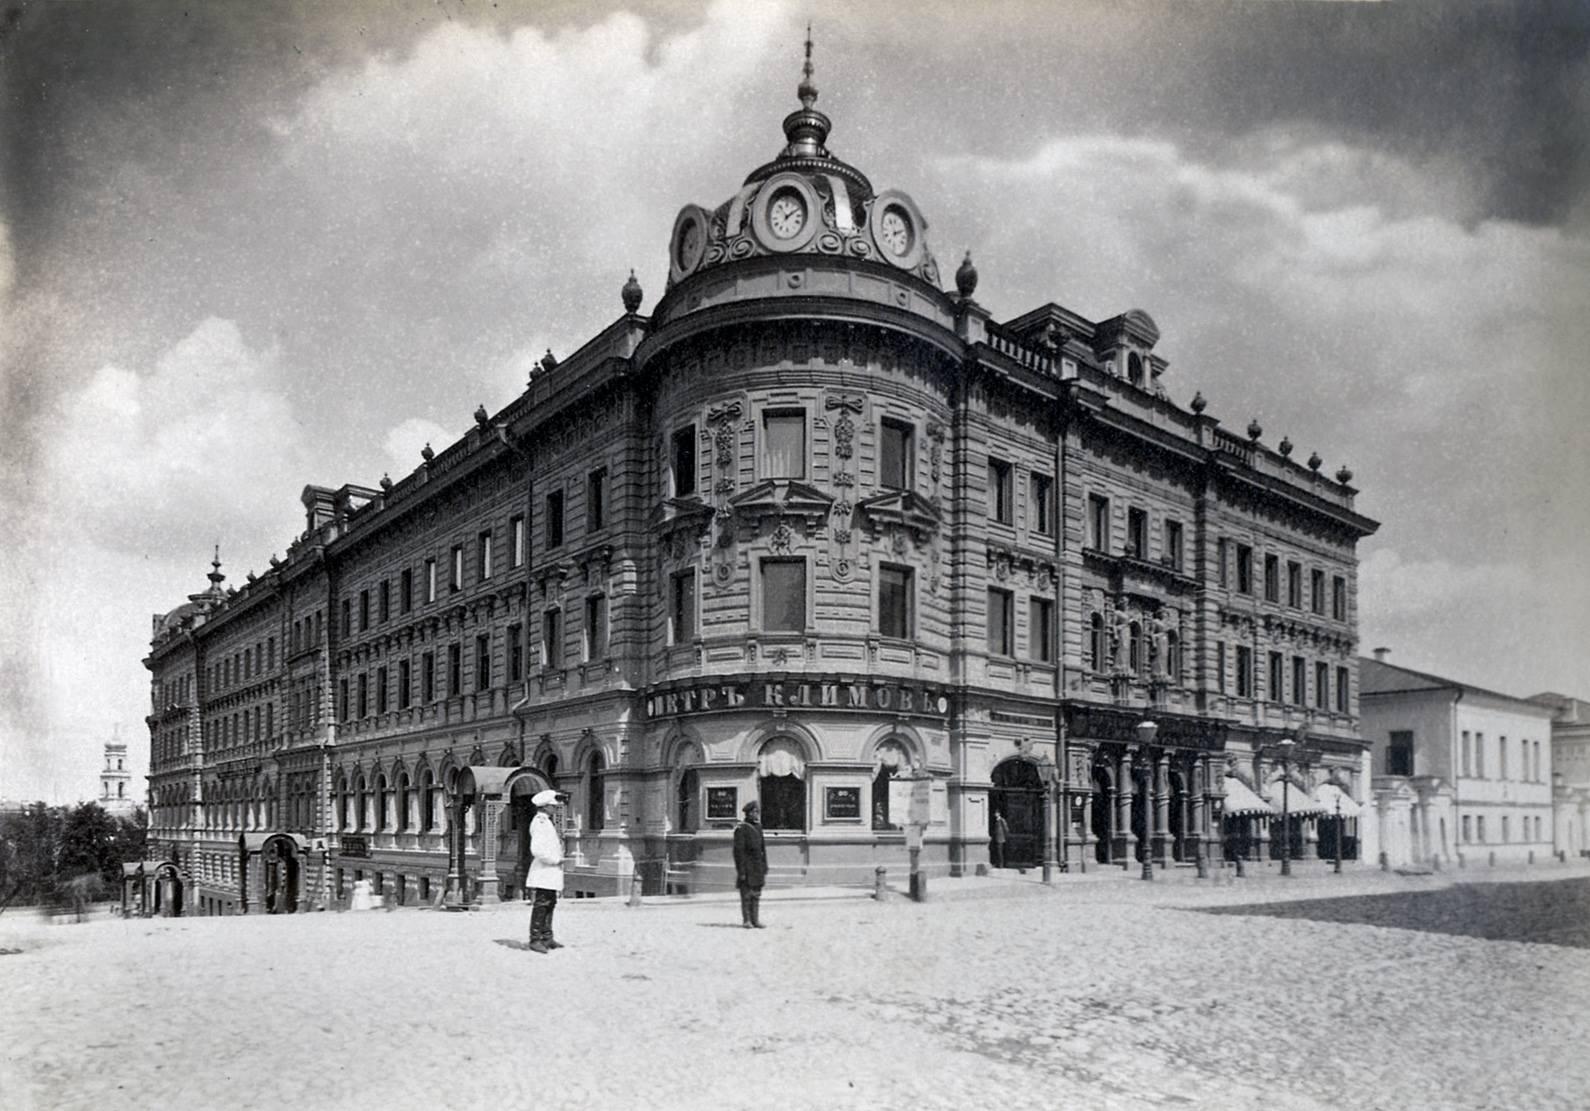 Александровский пассаж, 1892 год. Фото: Владимир Бебин